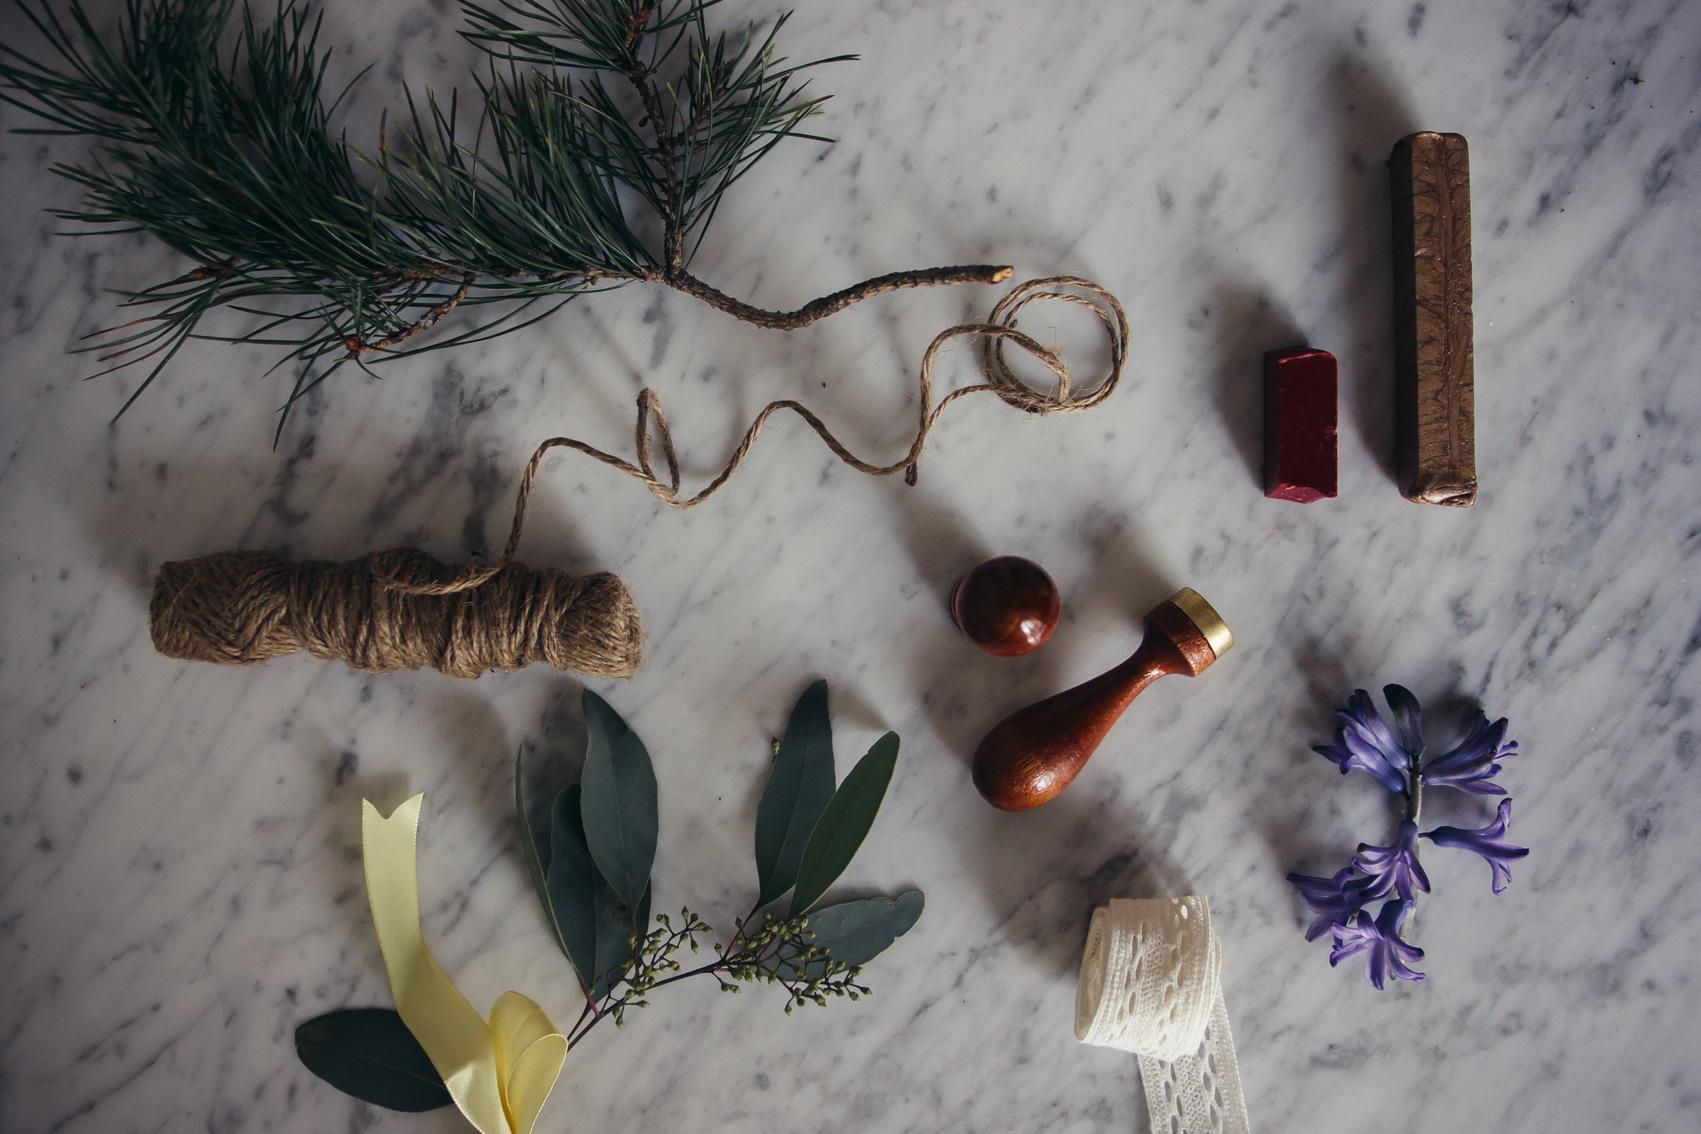 paketinslagning julklapp material midbec tapeter